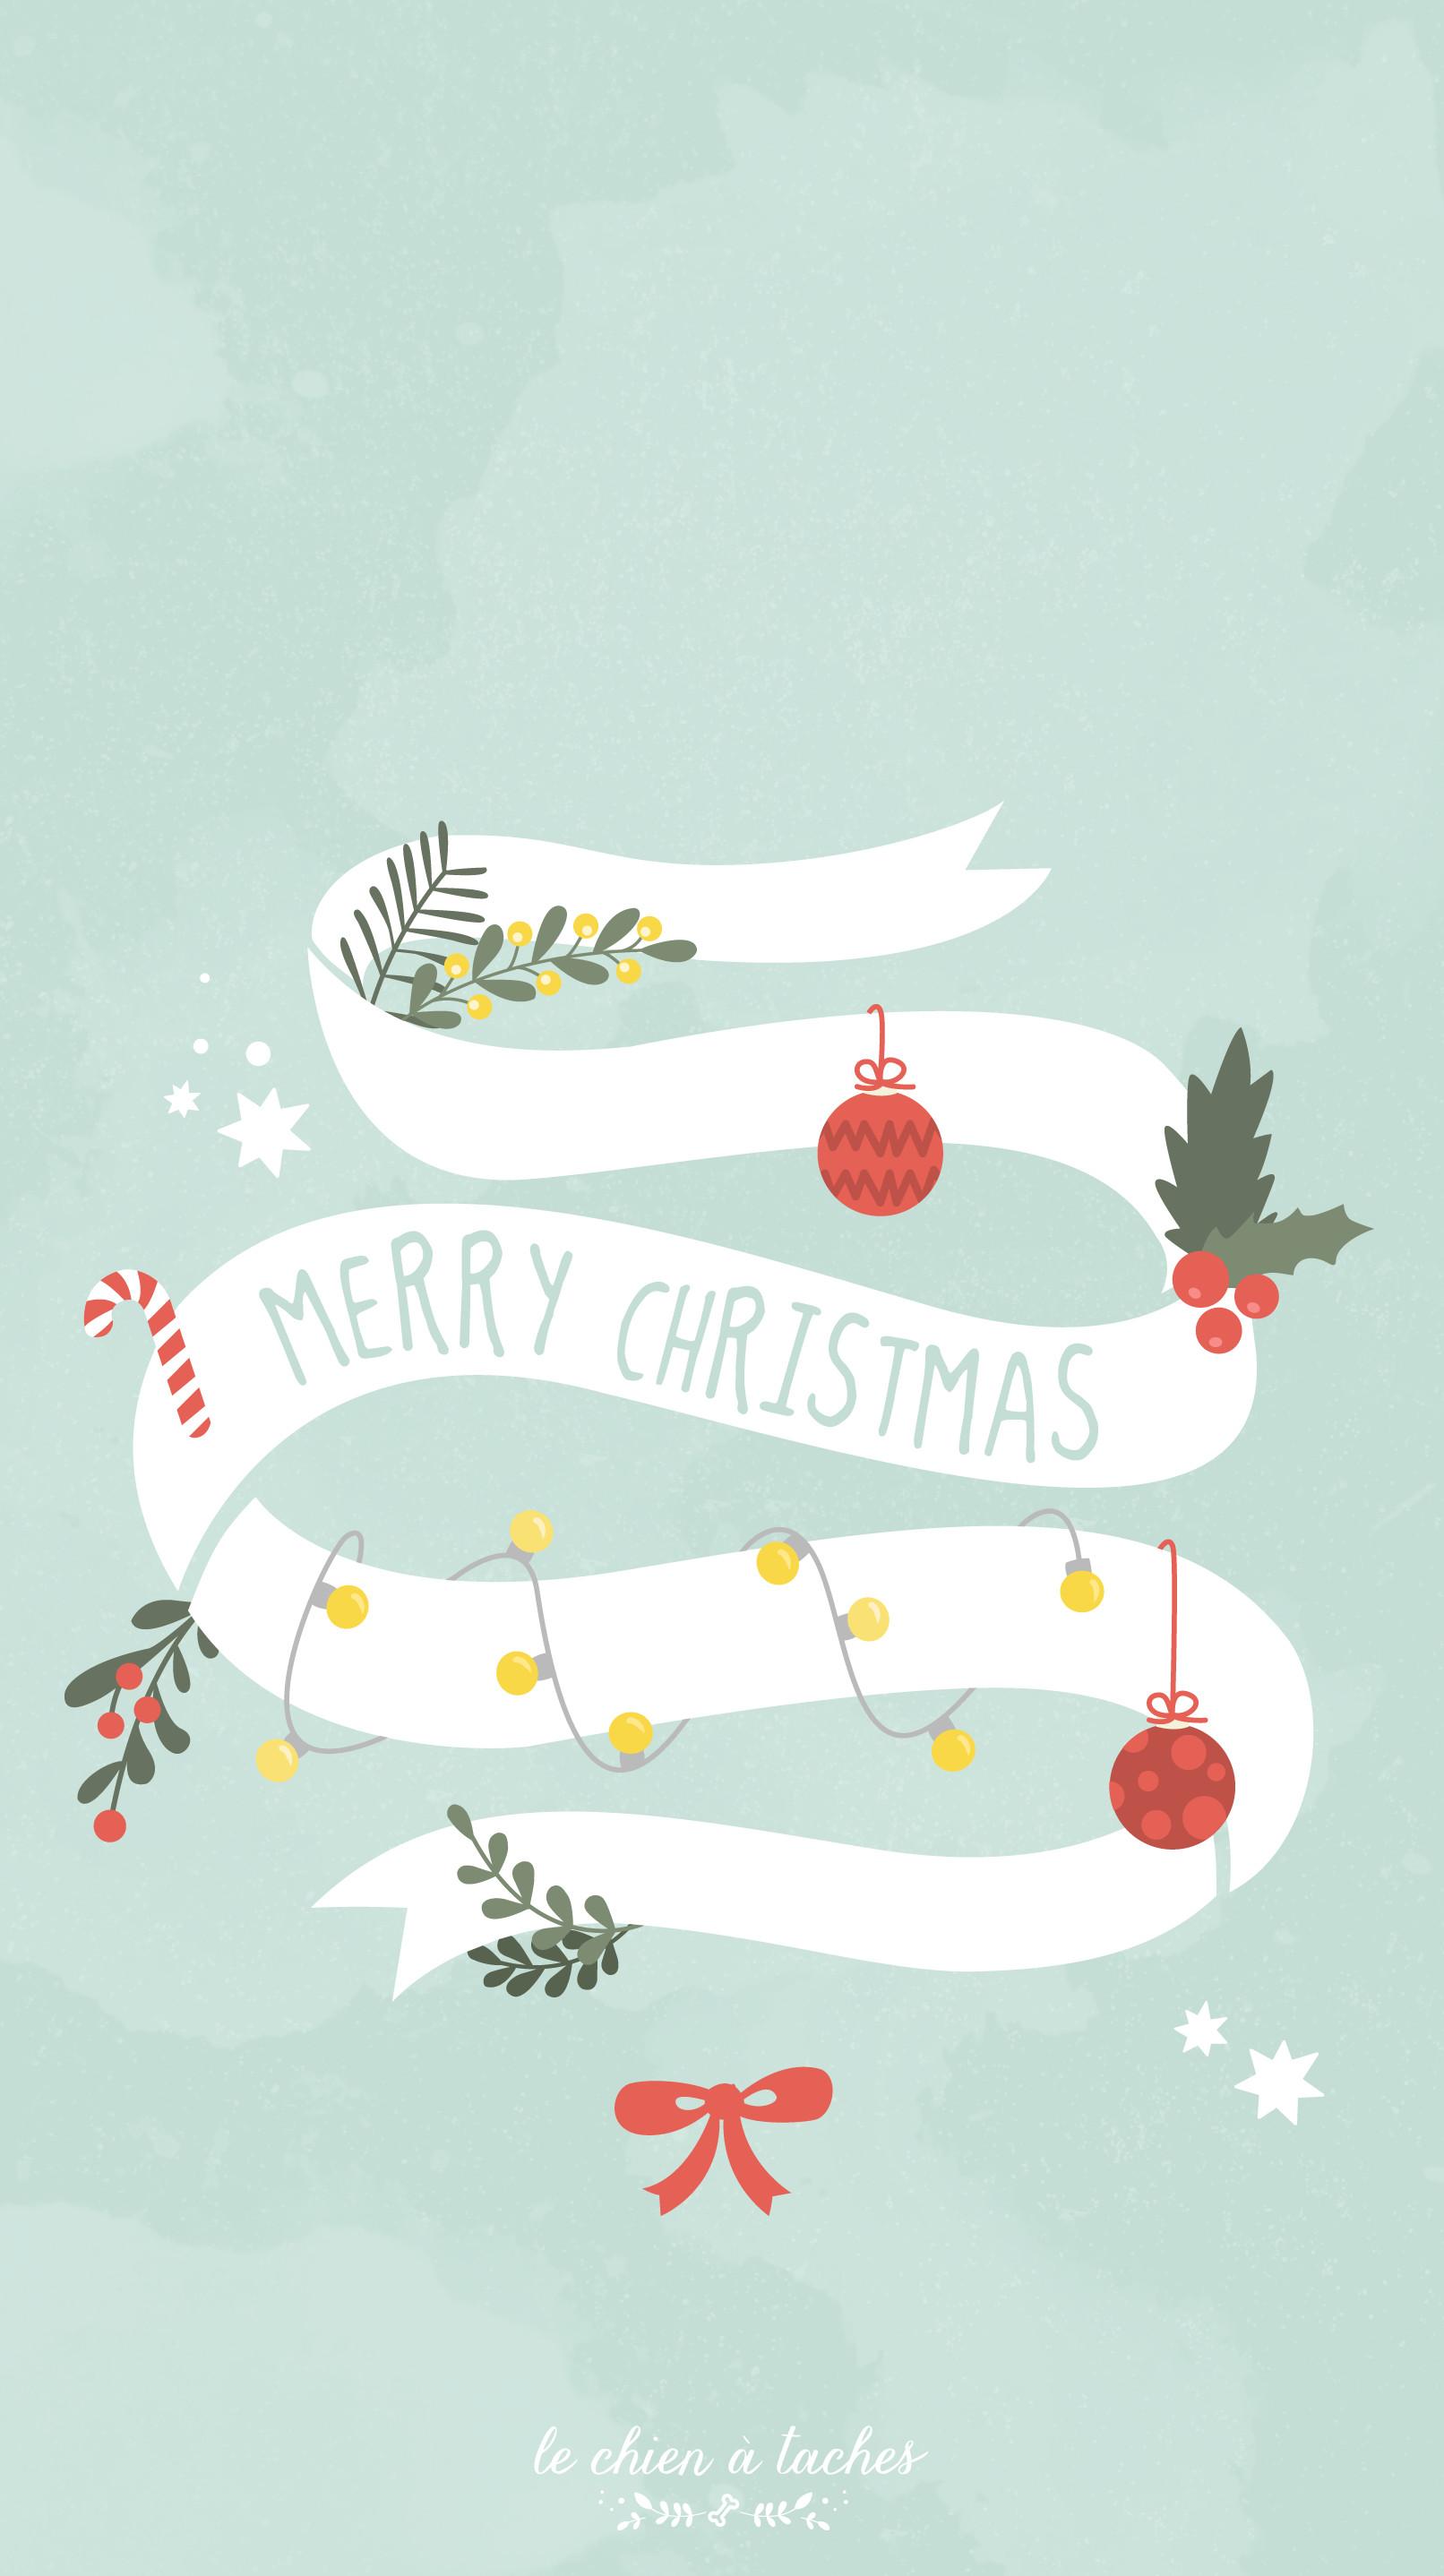 Cute Christmas Phone Wallpaper (56+ images)